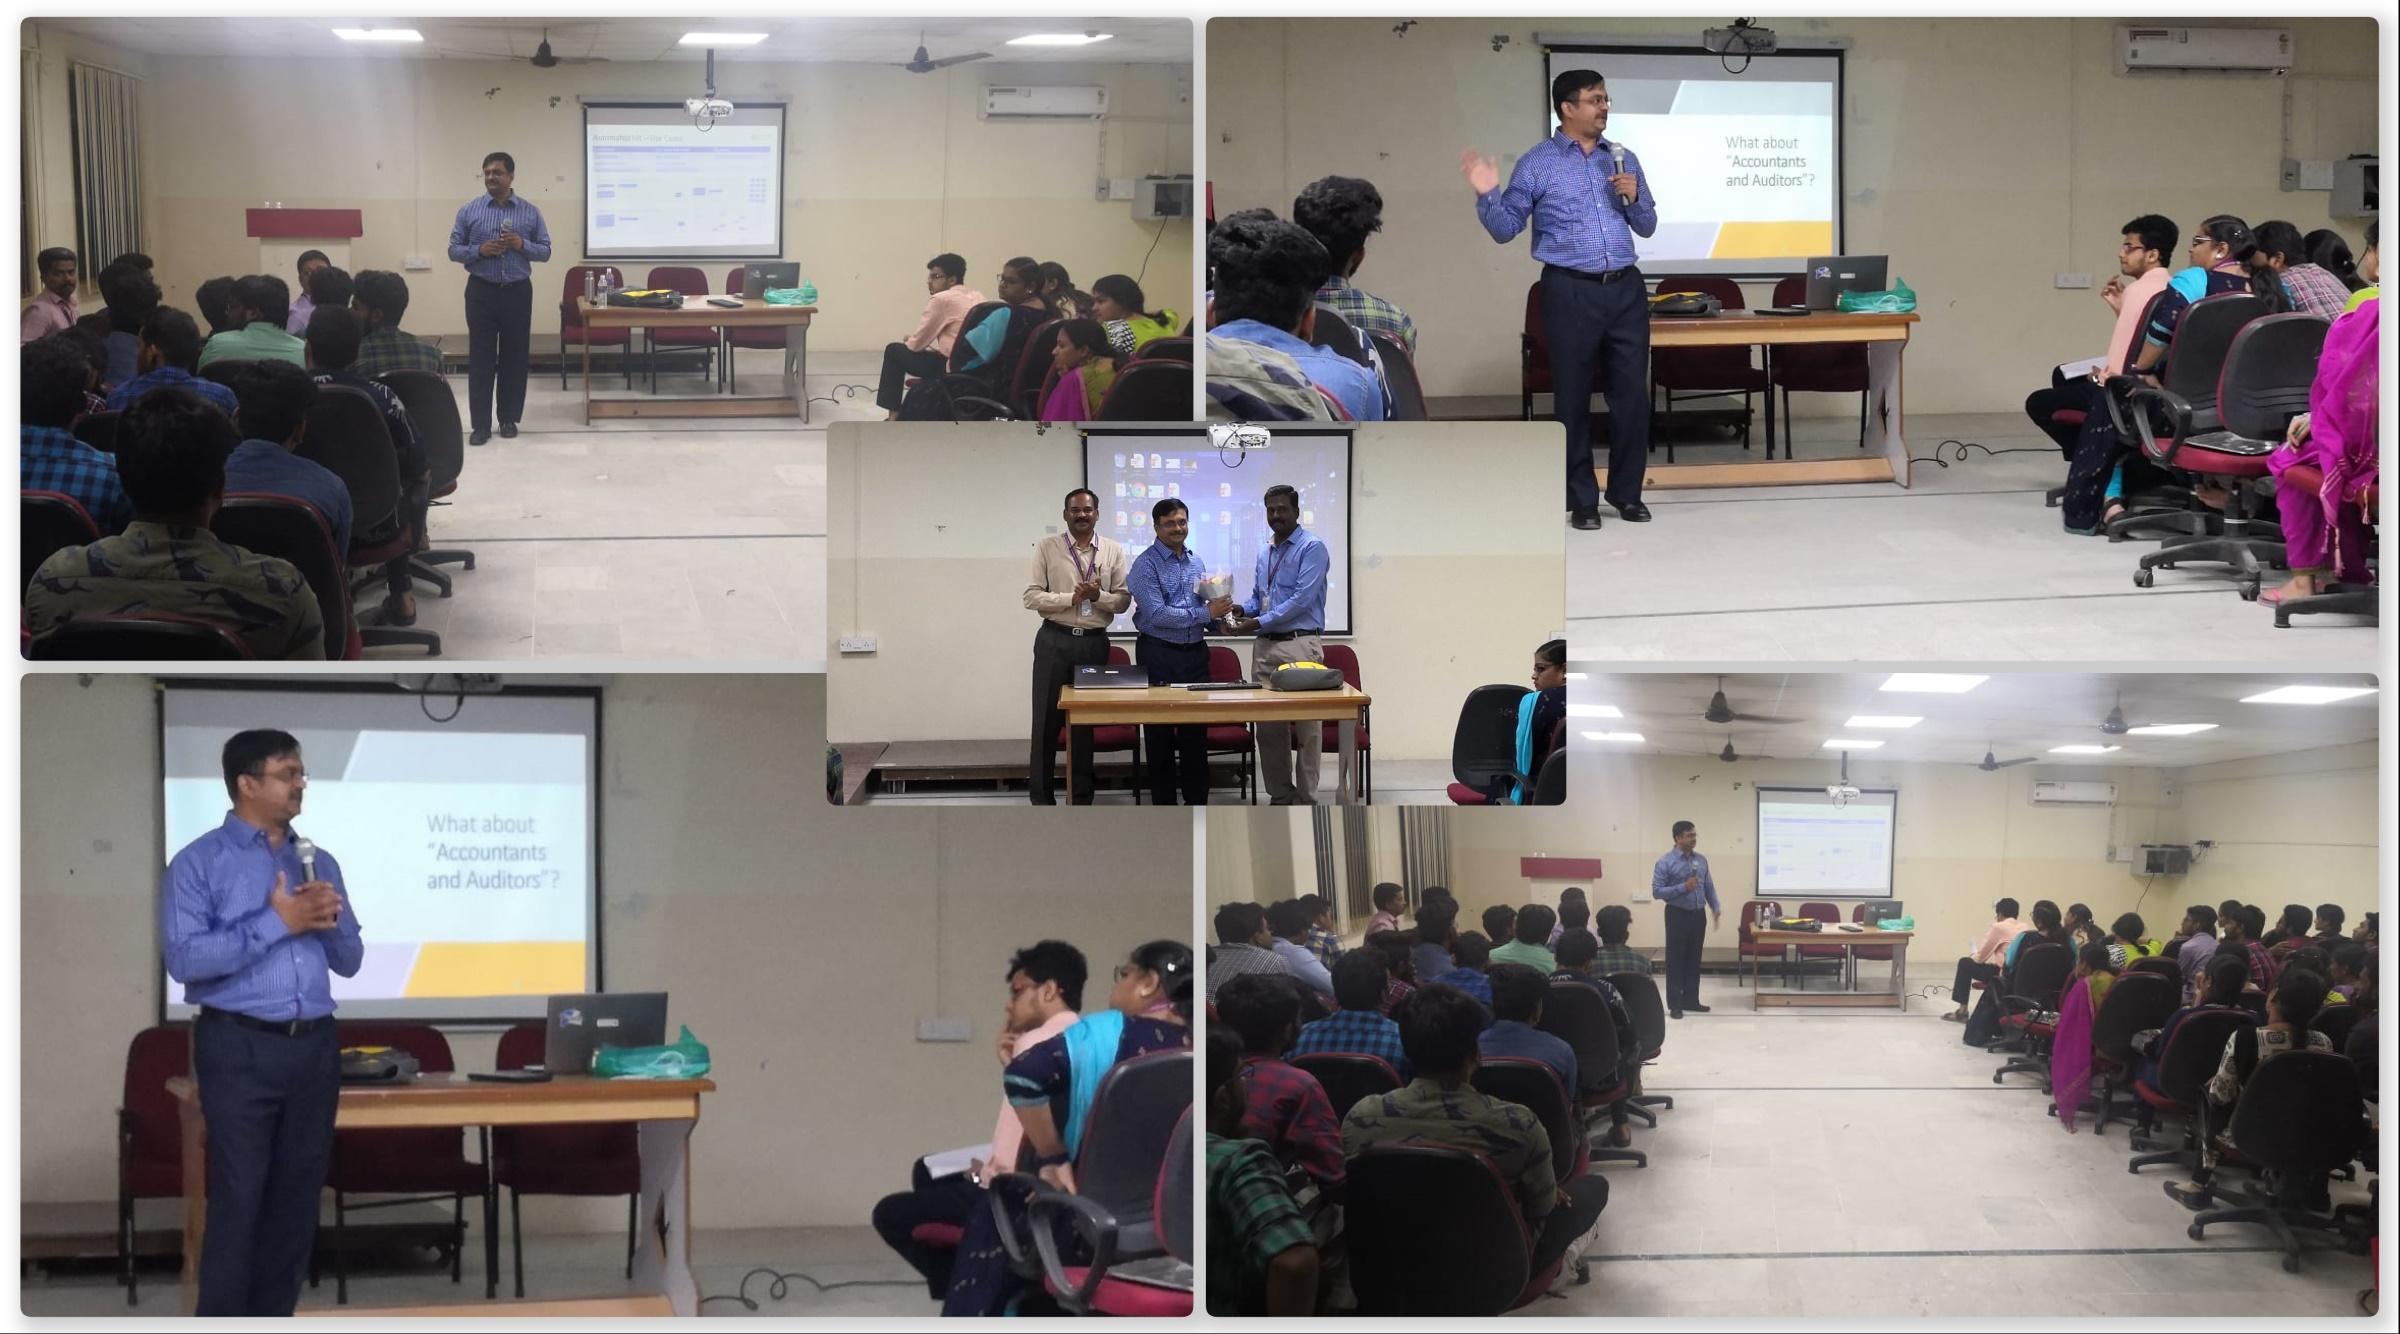 Career Options in Artificial Intelligence for engineering students by Venkatarangan Thirumalai